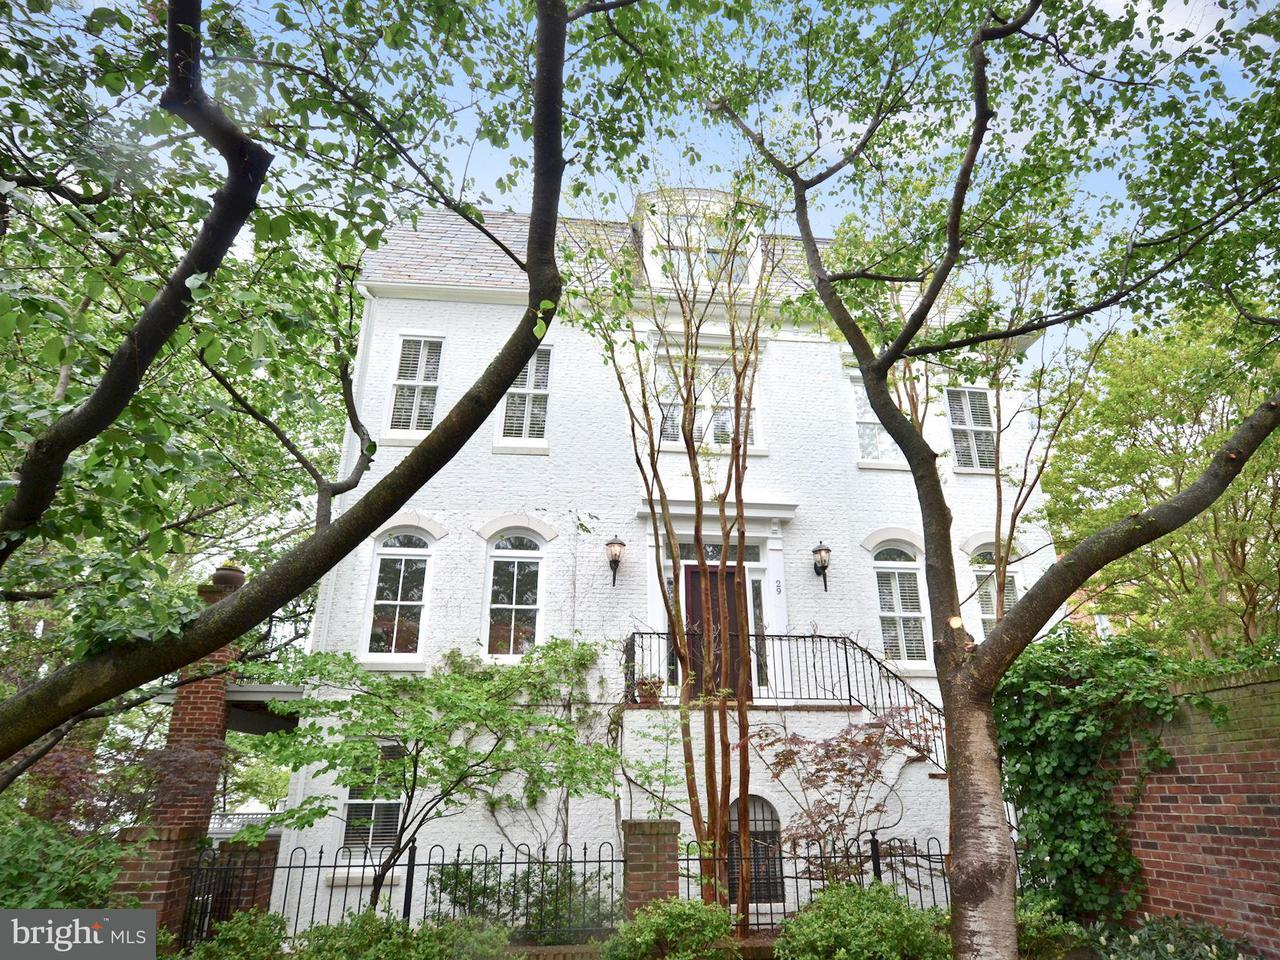 Casa unifamiliar adosada (Townhouse) por un Venta en 29 KEITHS Lane 29 KEITHS Lane Alexandria, Virginia 22314 Estados Unidos